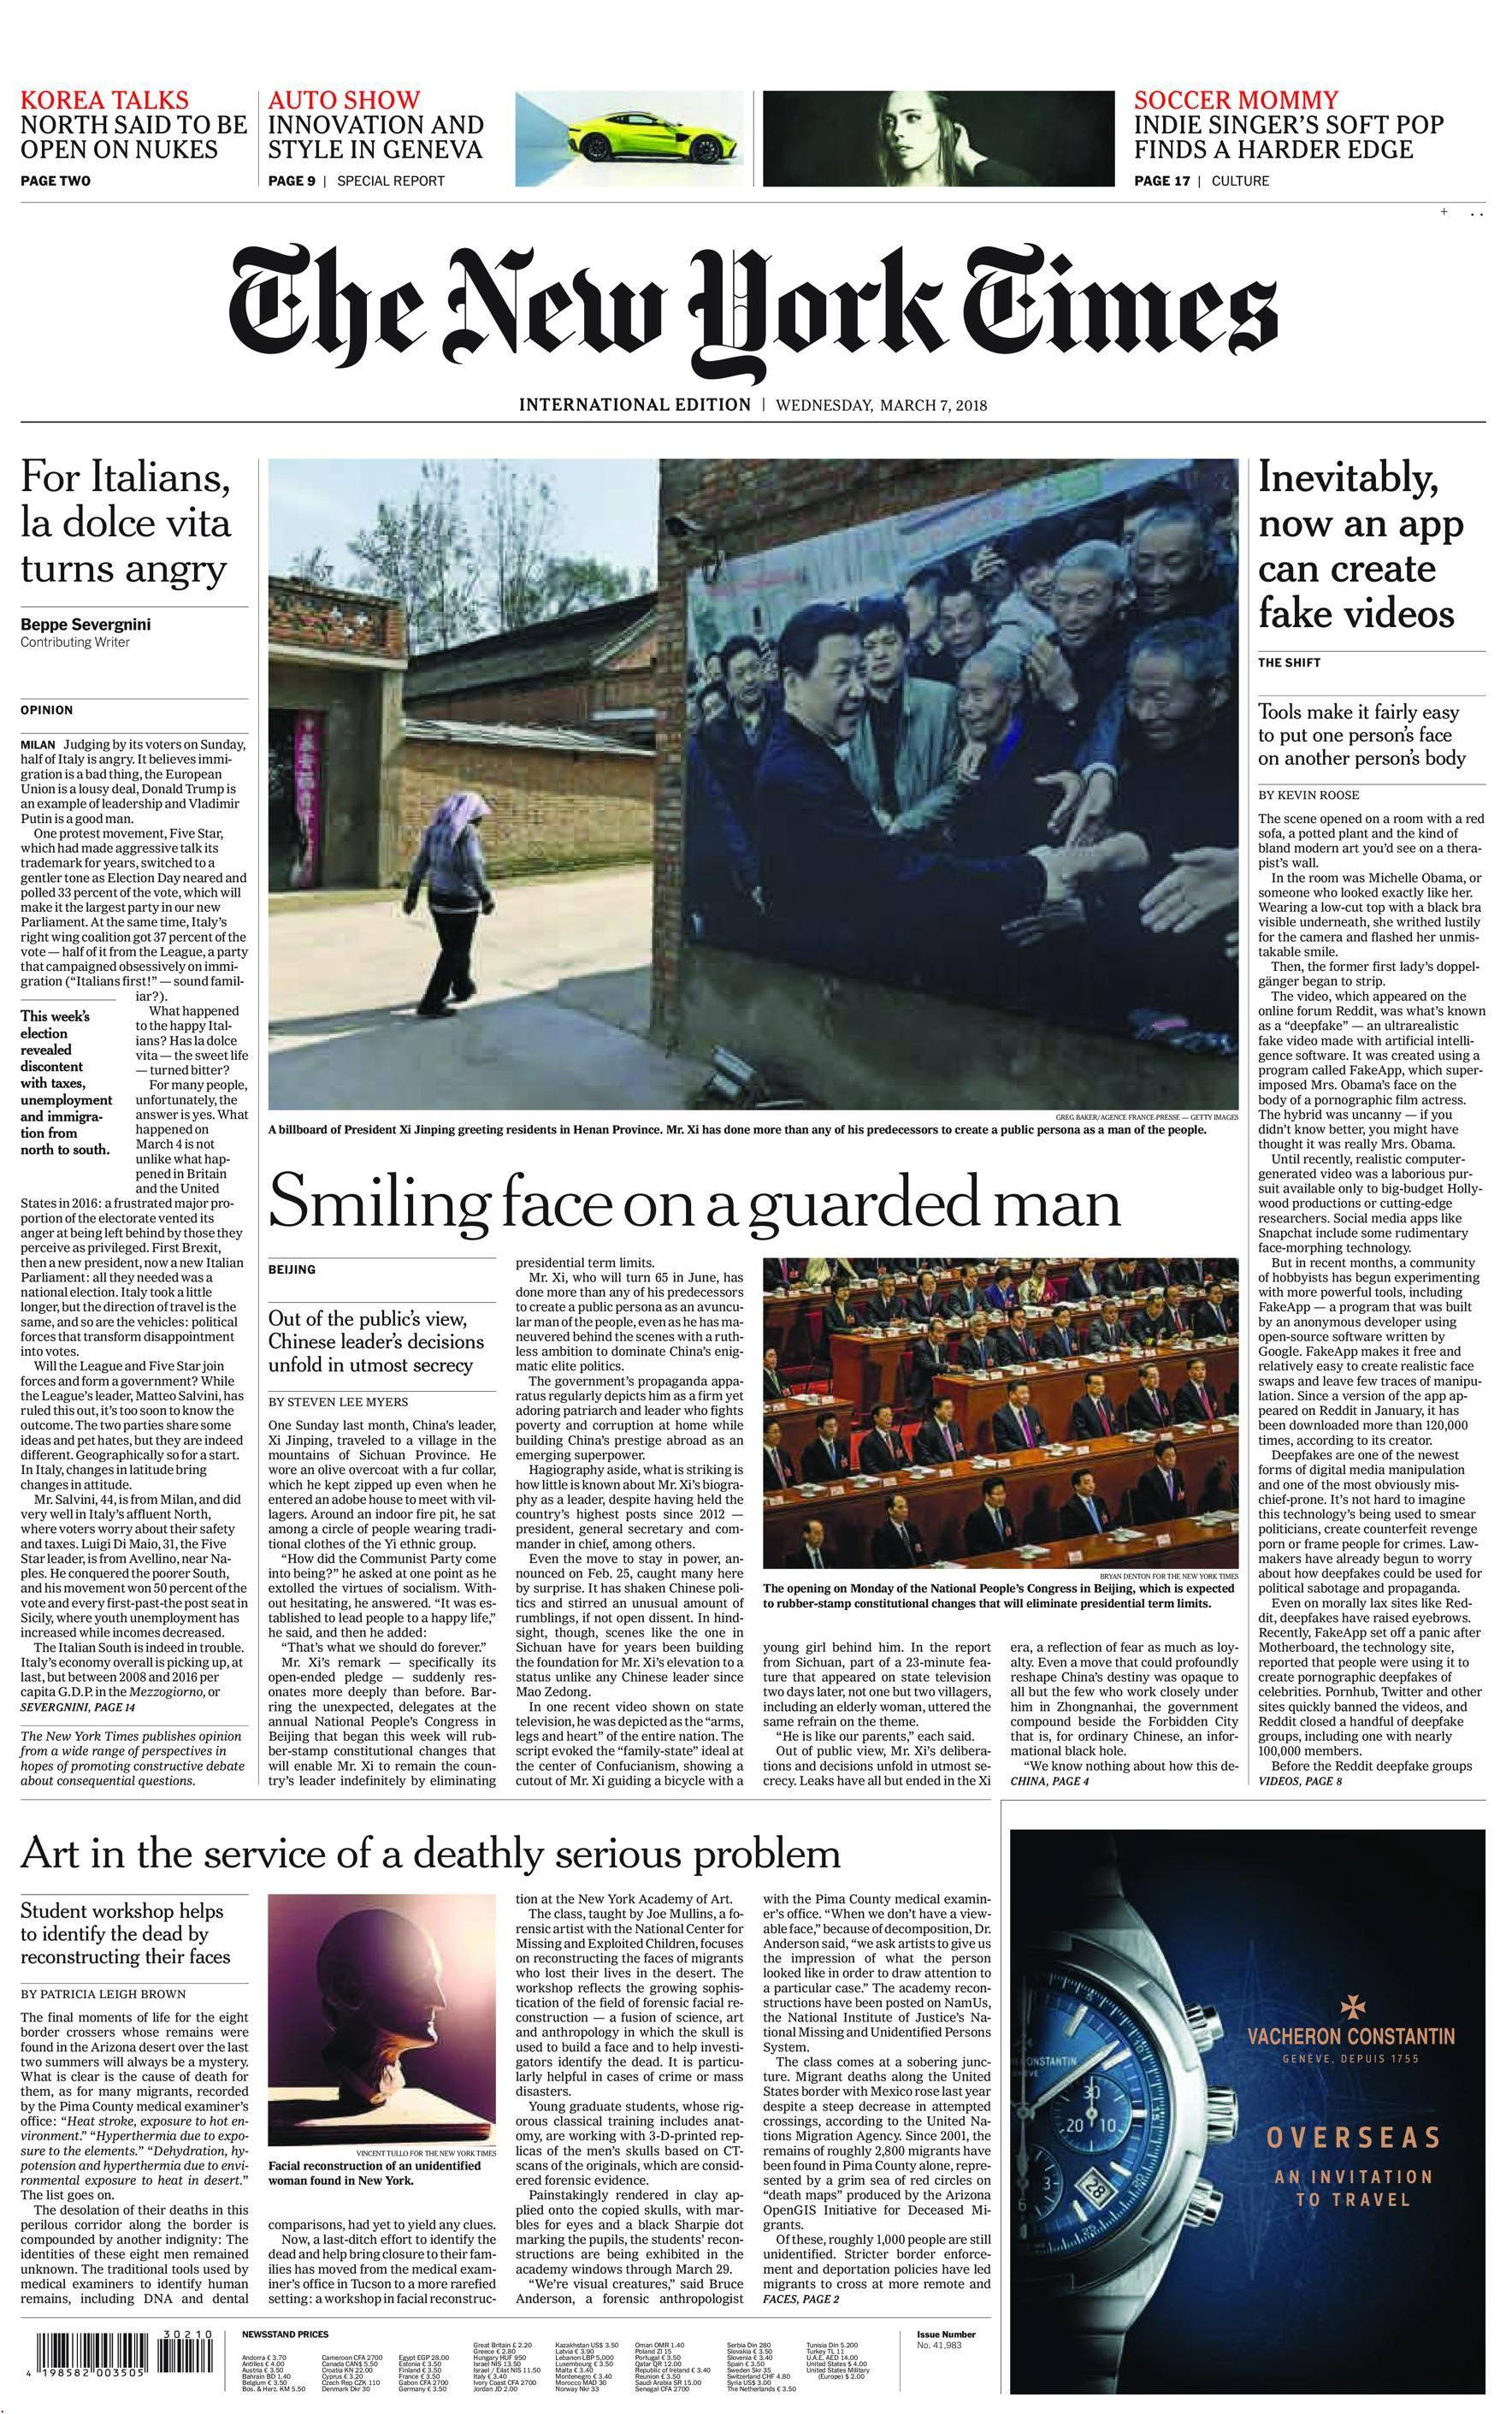 International New York Times - 07 March 2018